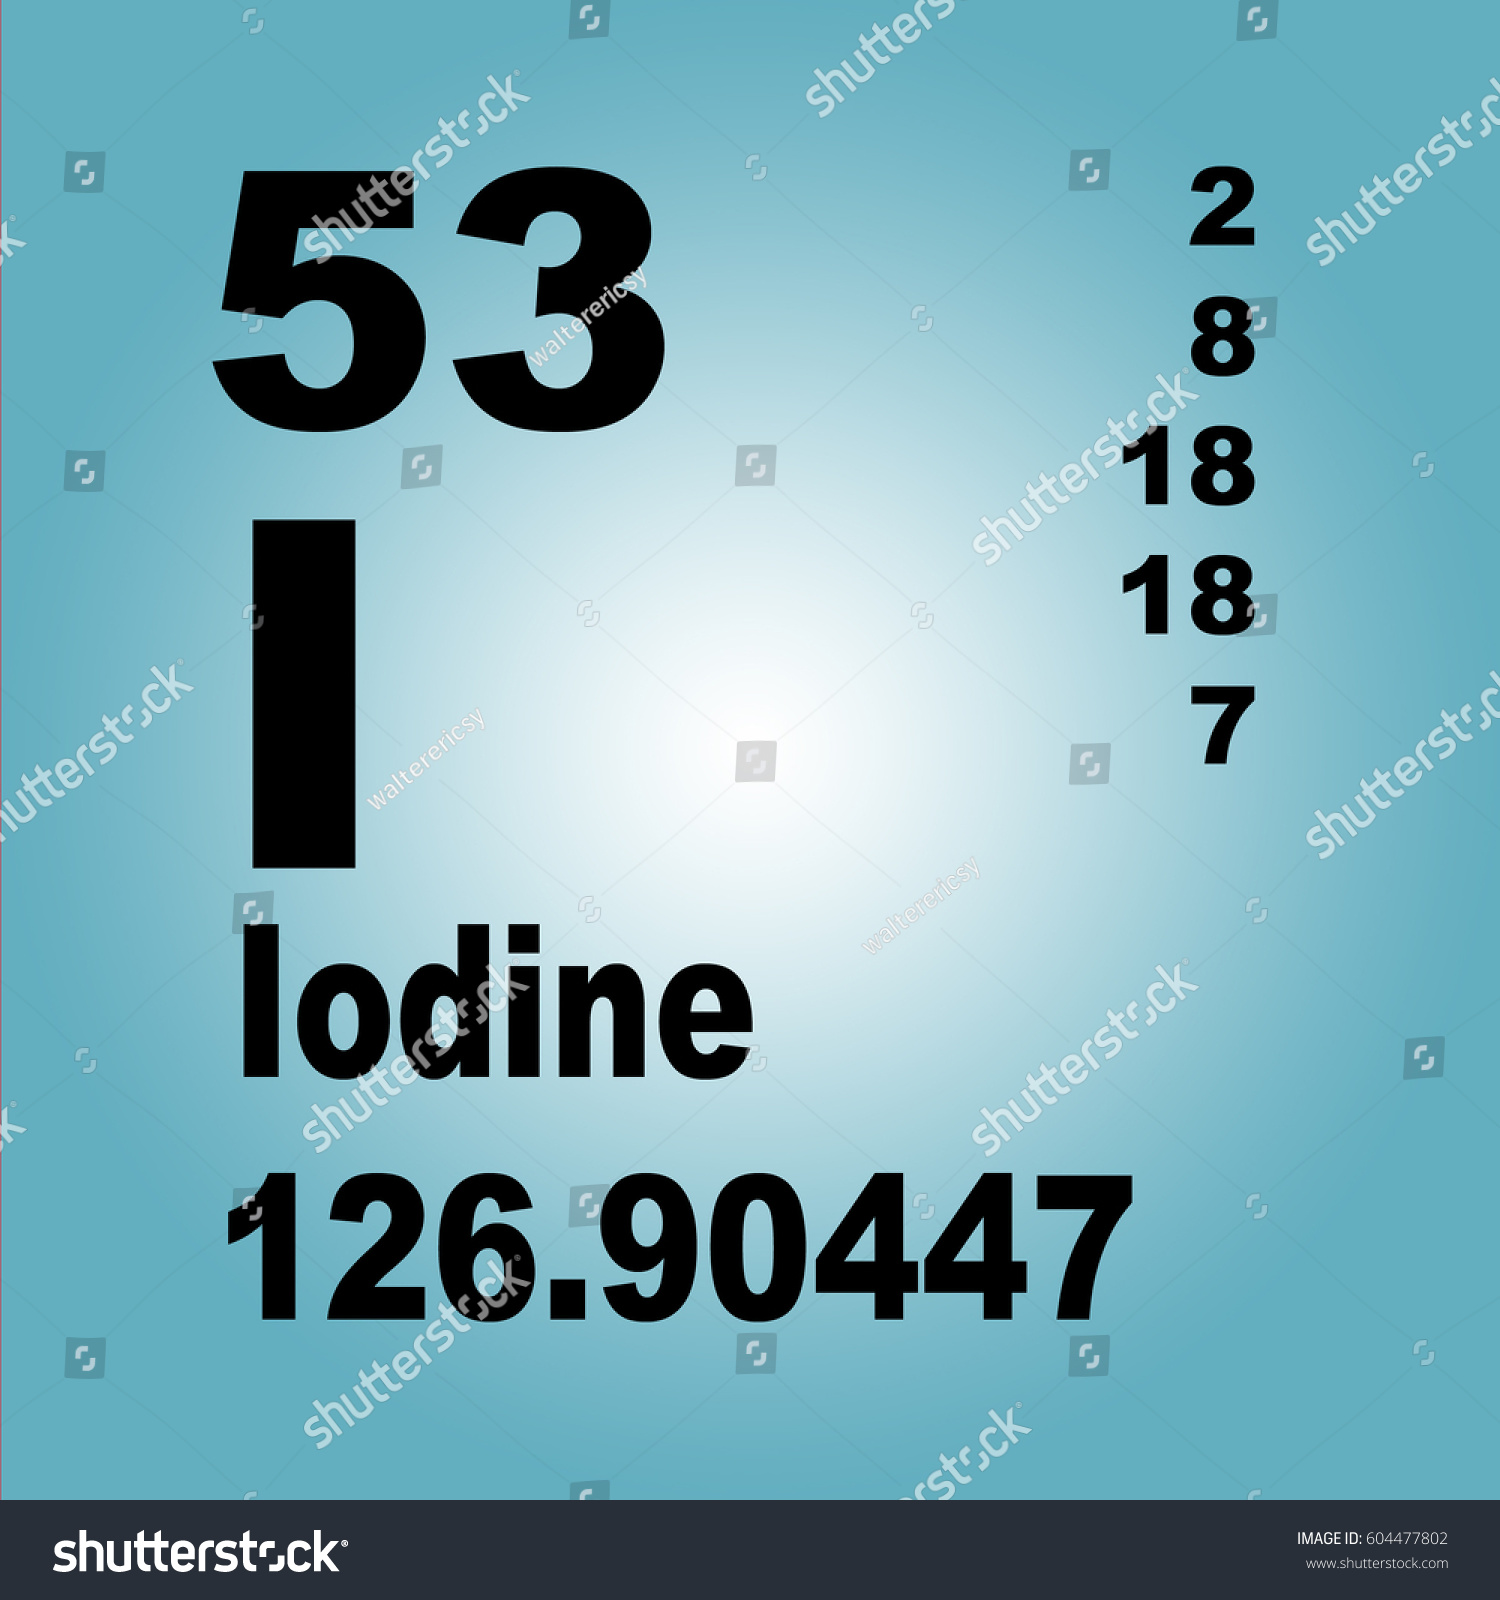 Iodine periodic table elements stock illustration 604477802 iodine periodic table of elements gamestrikefo Choice Image